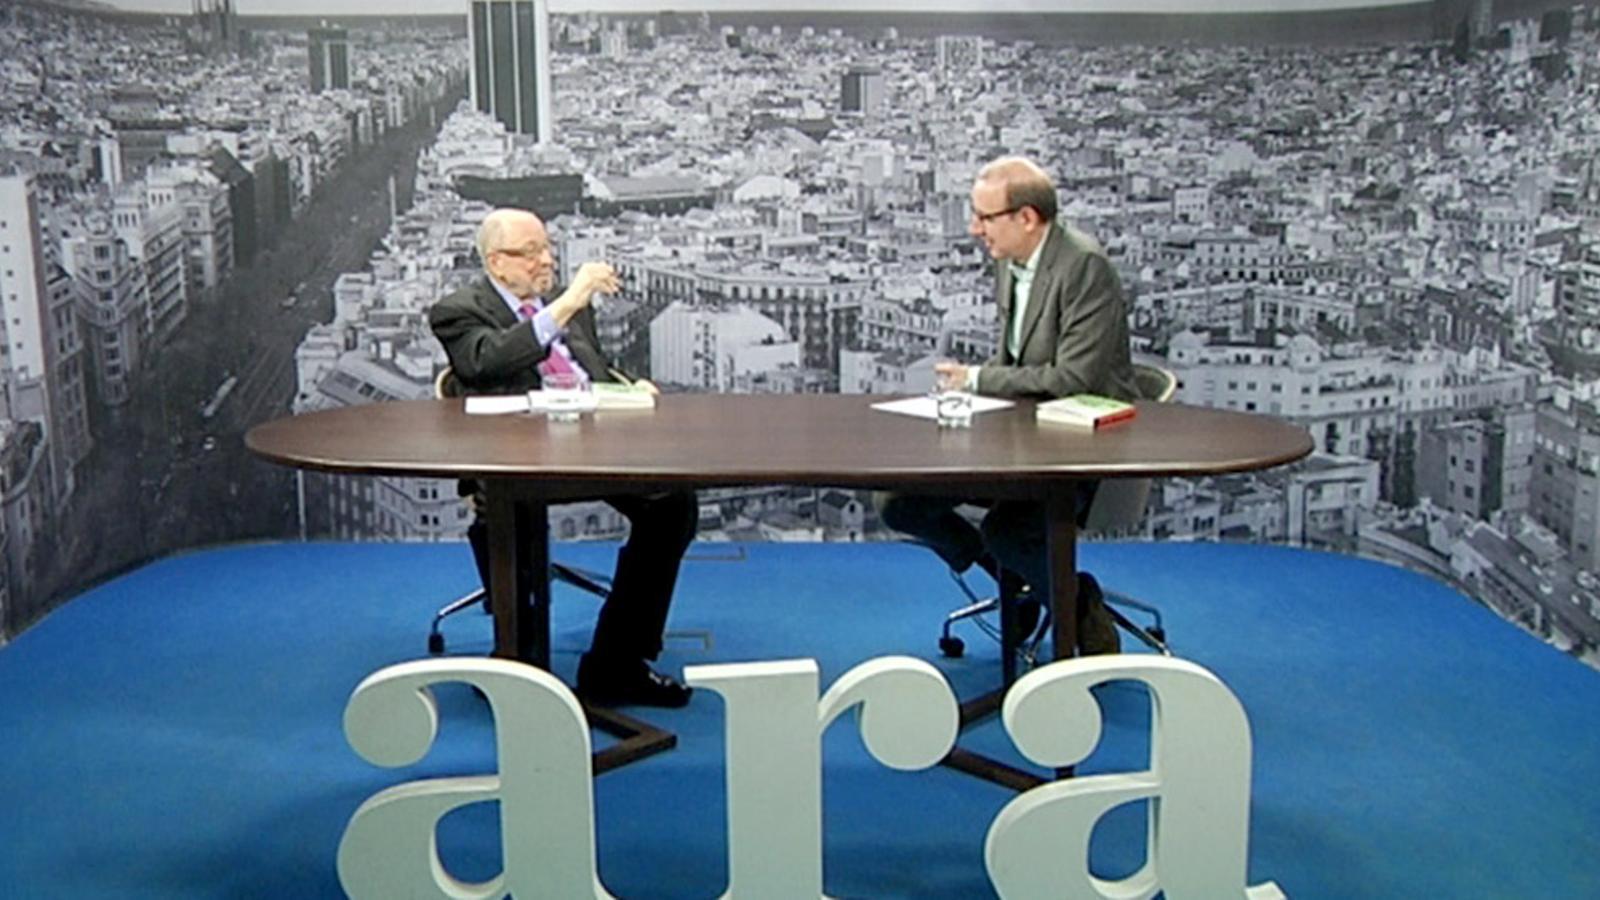 Entrevista d'Antoni Bassas a Francesc Sanuy